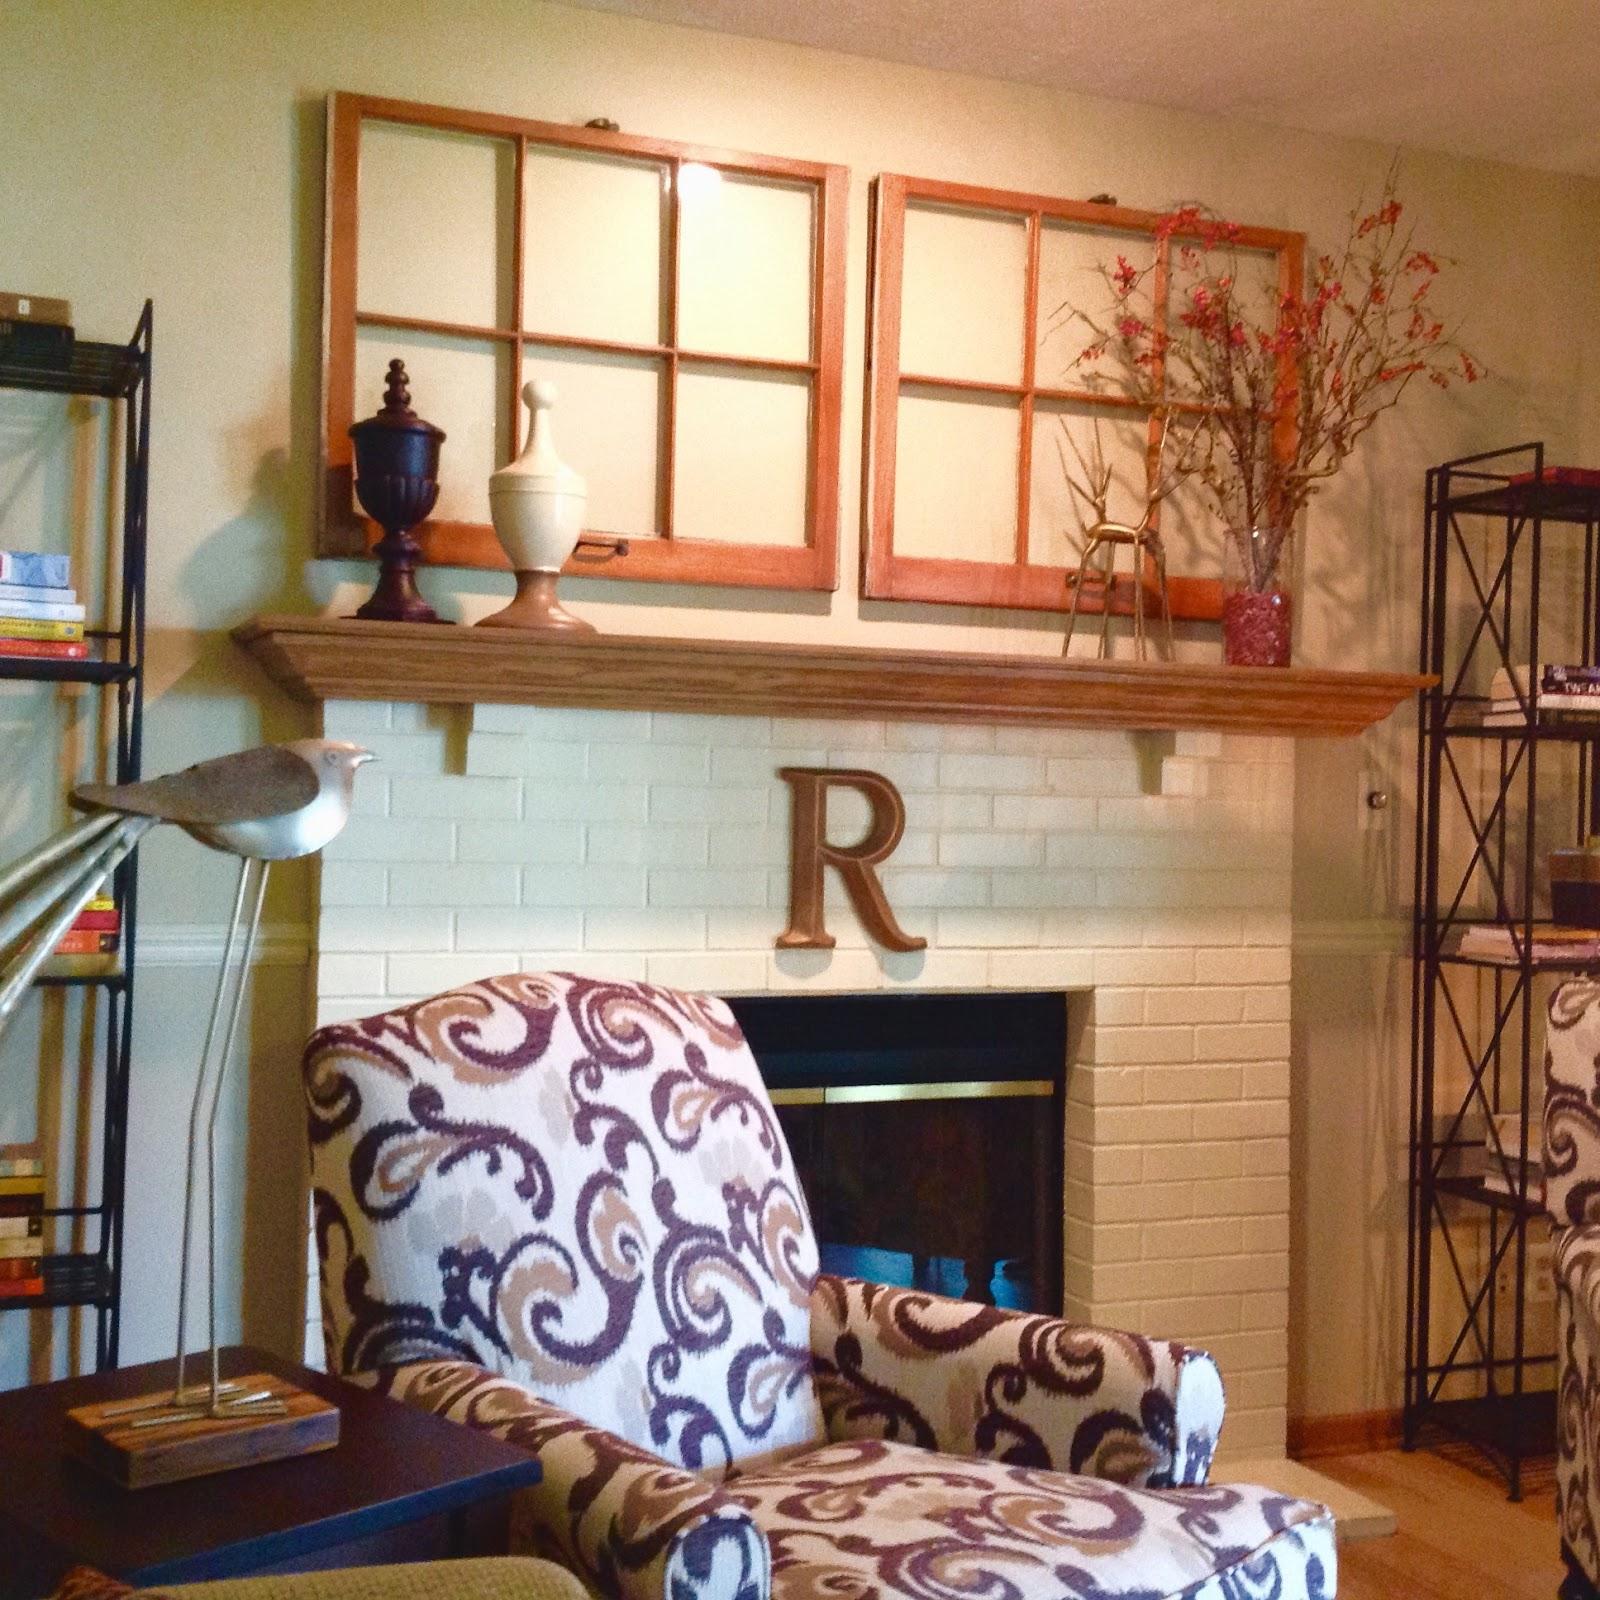 Hearth Room: Renaissance Mermaid: Hearth Room Dressed For Fall